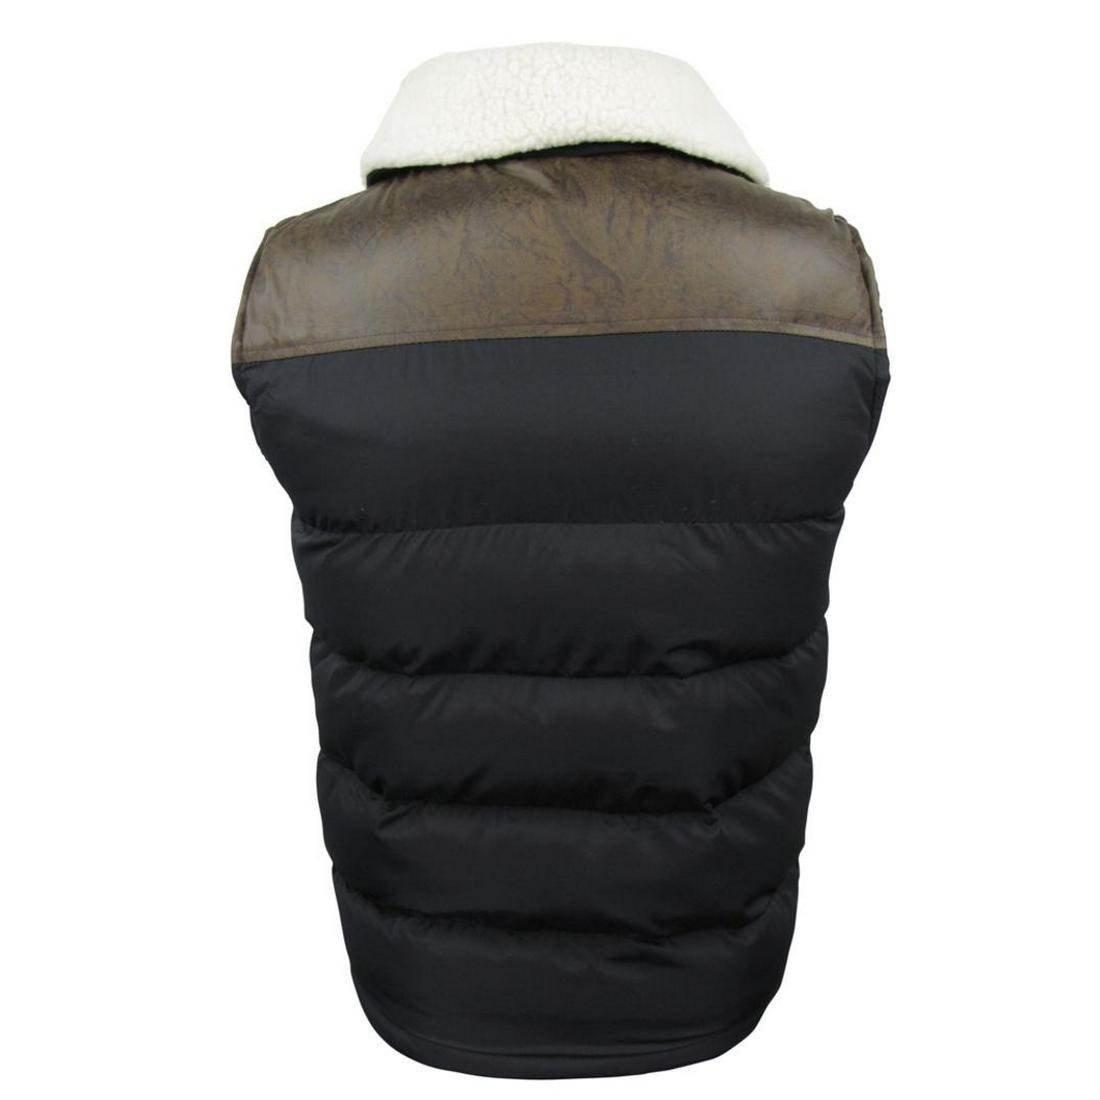 Fieldfox Mens Gilet Decker Body Warmer Sleeveless Coat Jacket Padded New Sherpa Collared